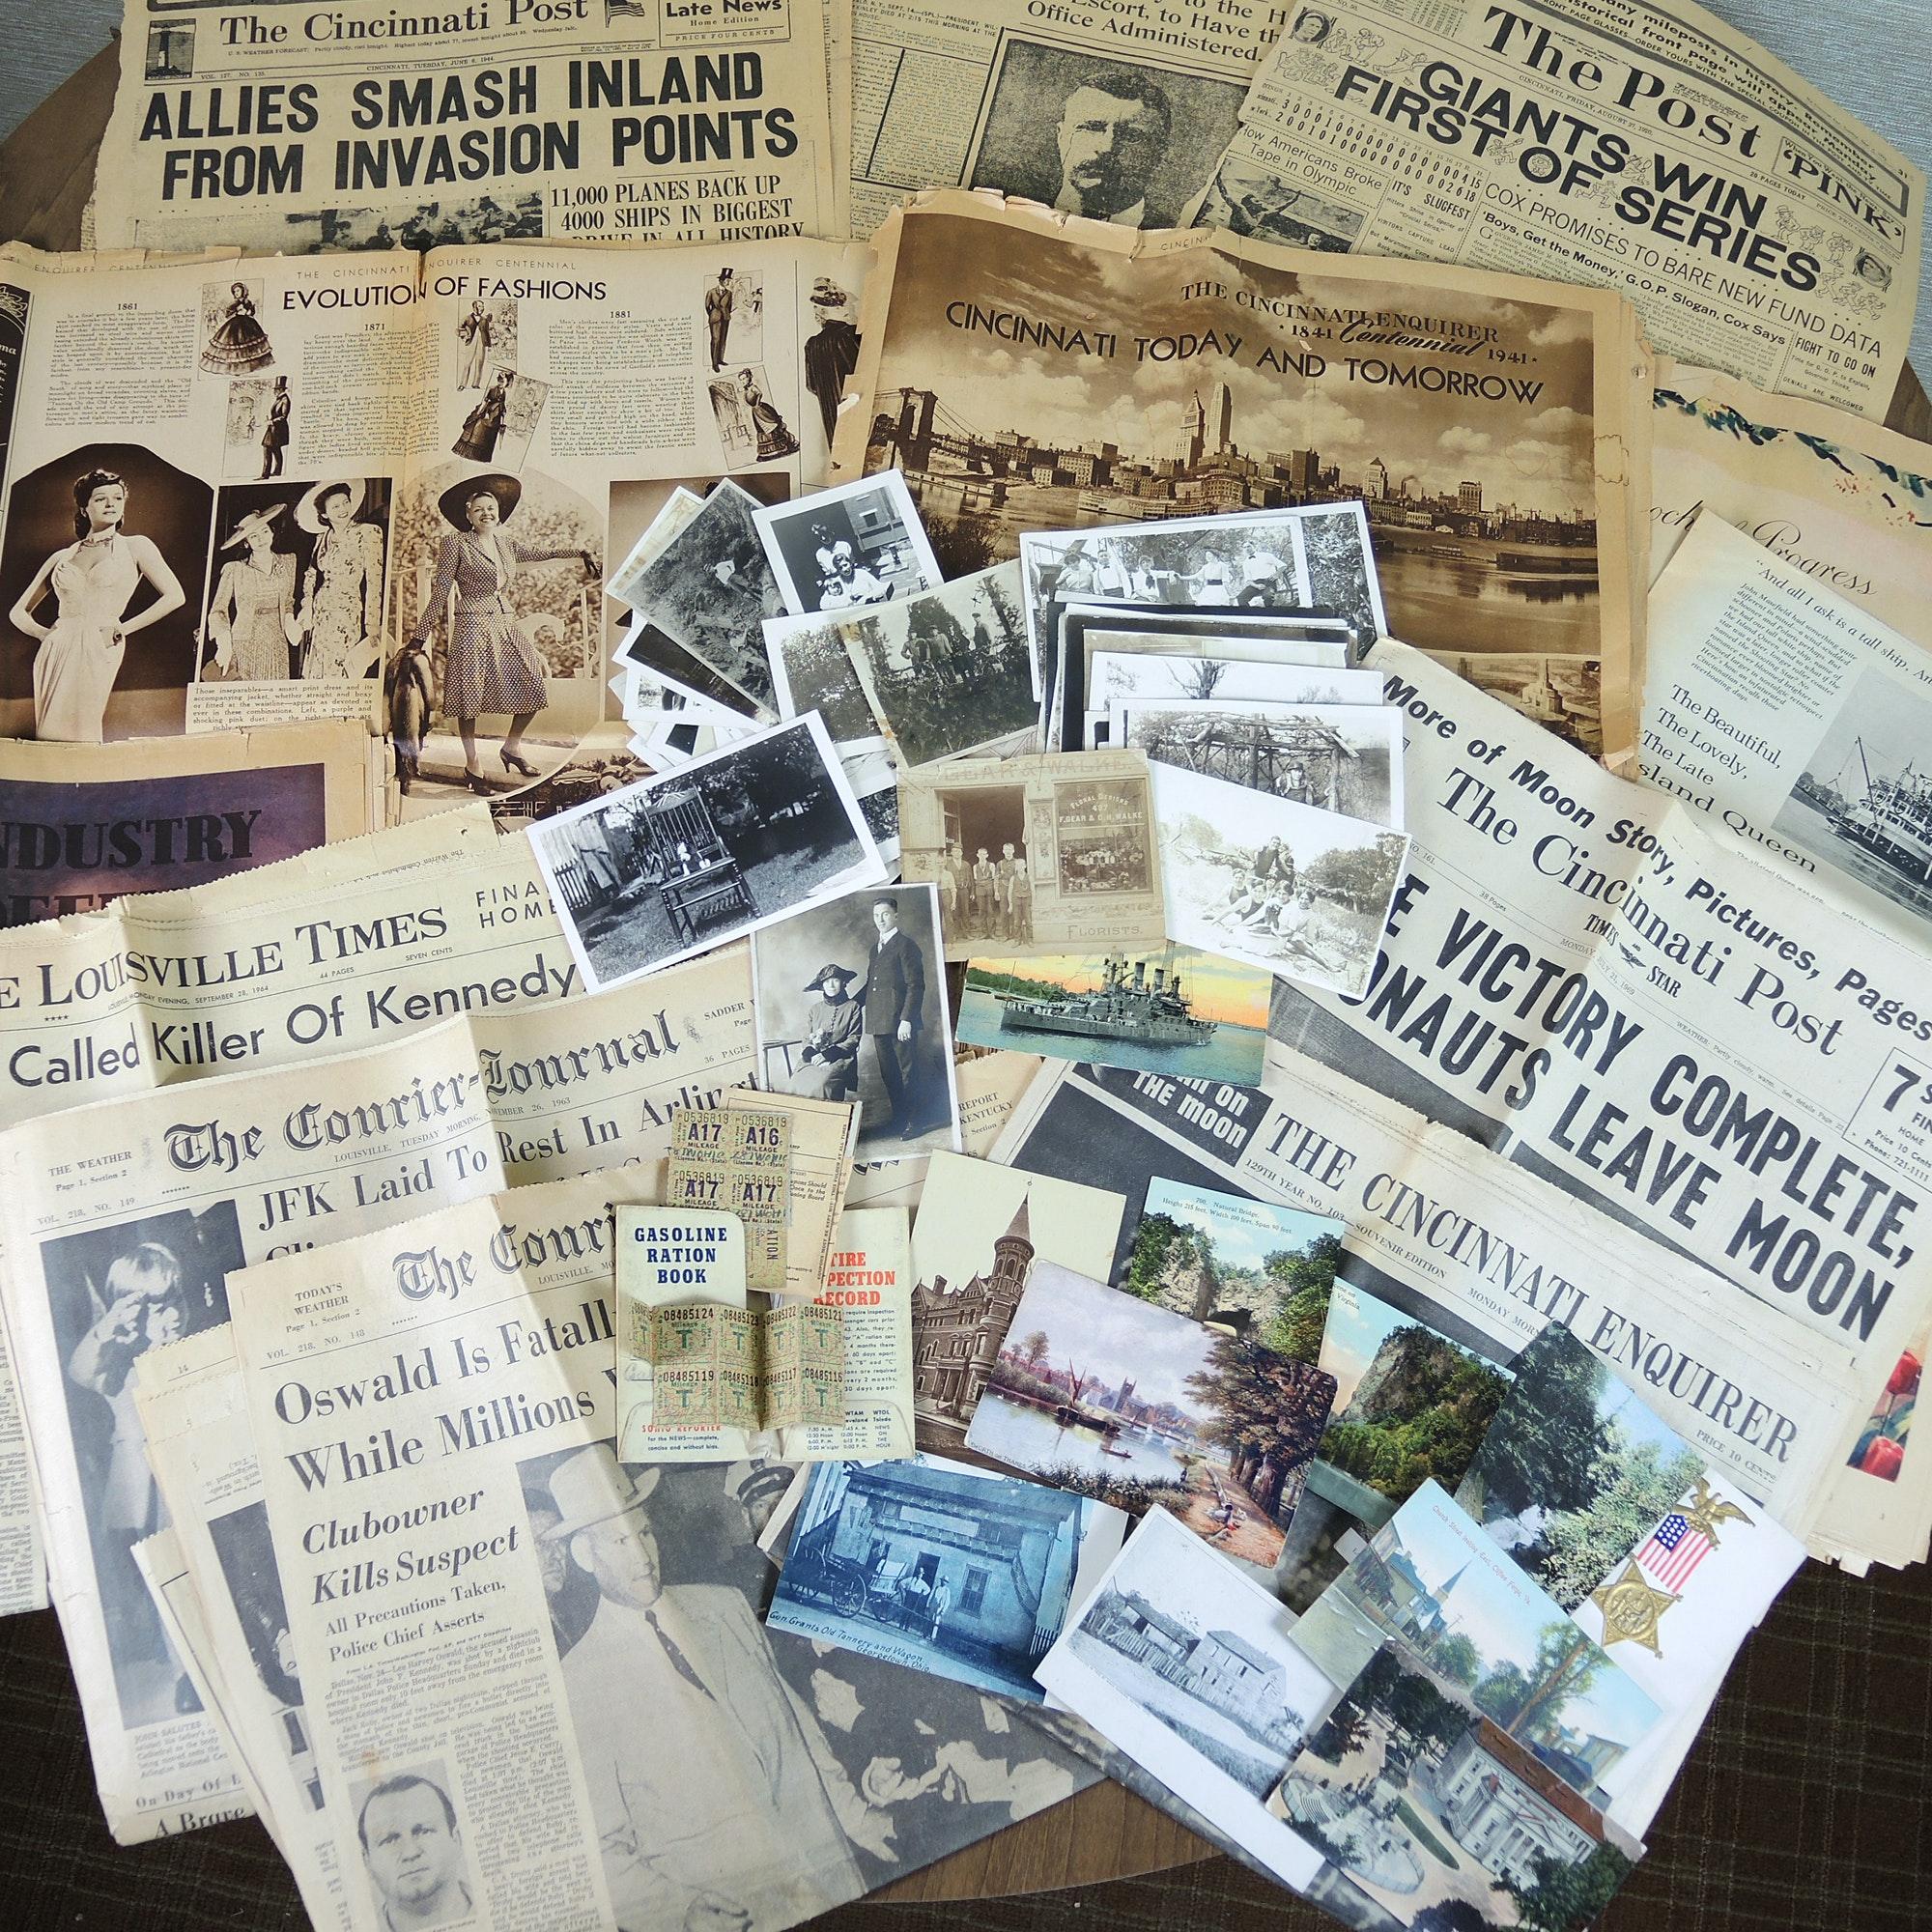 WWII Era Ration Cards, Vintage Newspapers, Postcards, Photographs